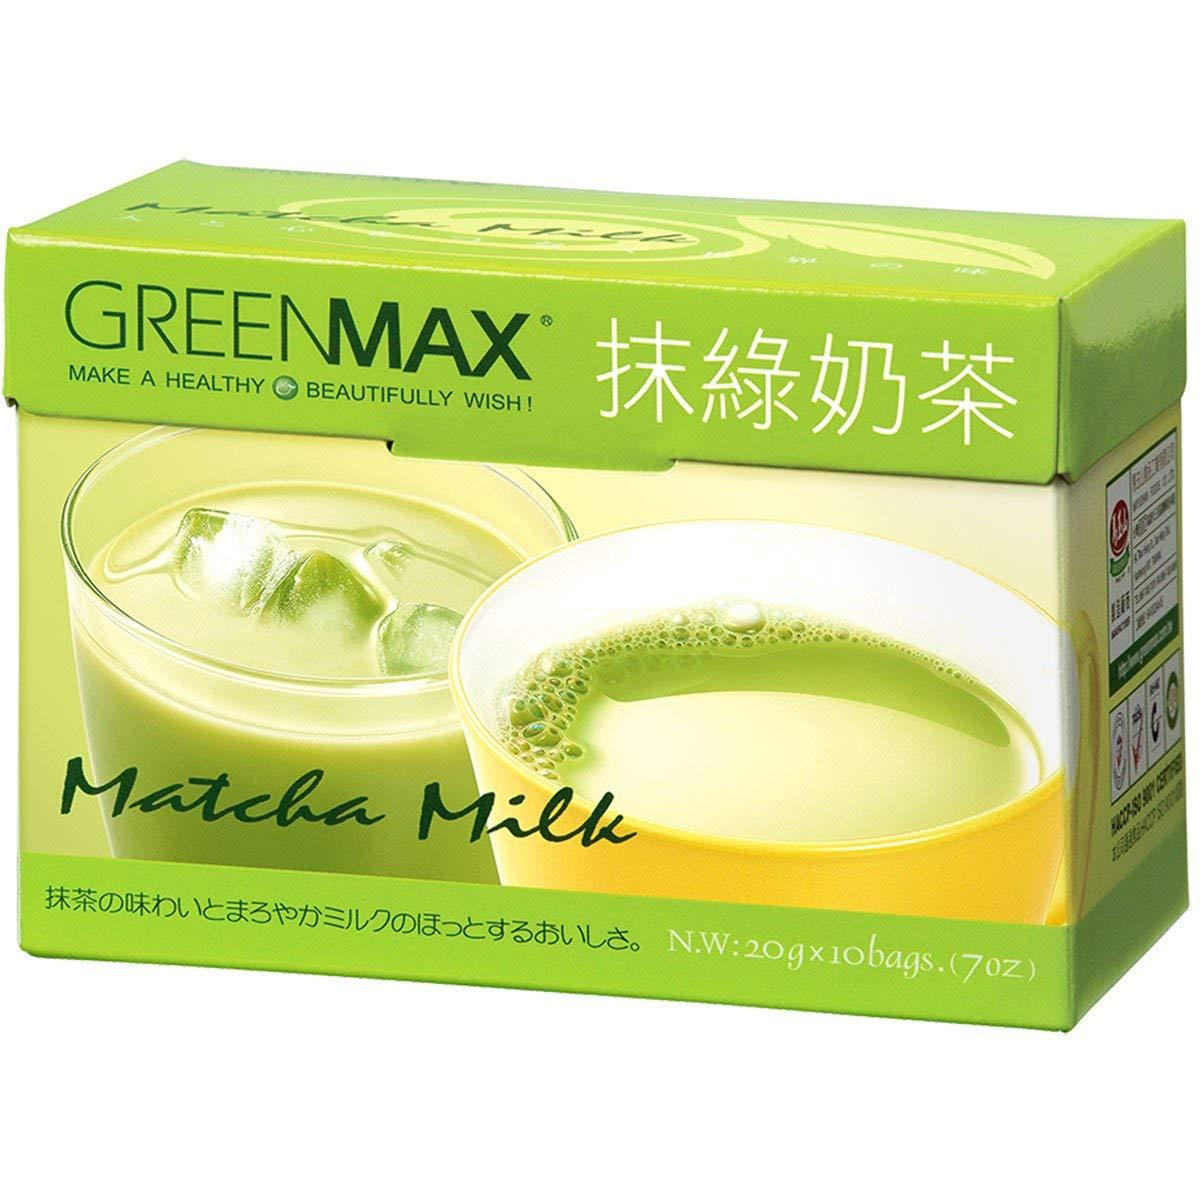 Greenmax -Matcha Milk (Instant Green Milk Tea) z (Pack of 1)